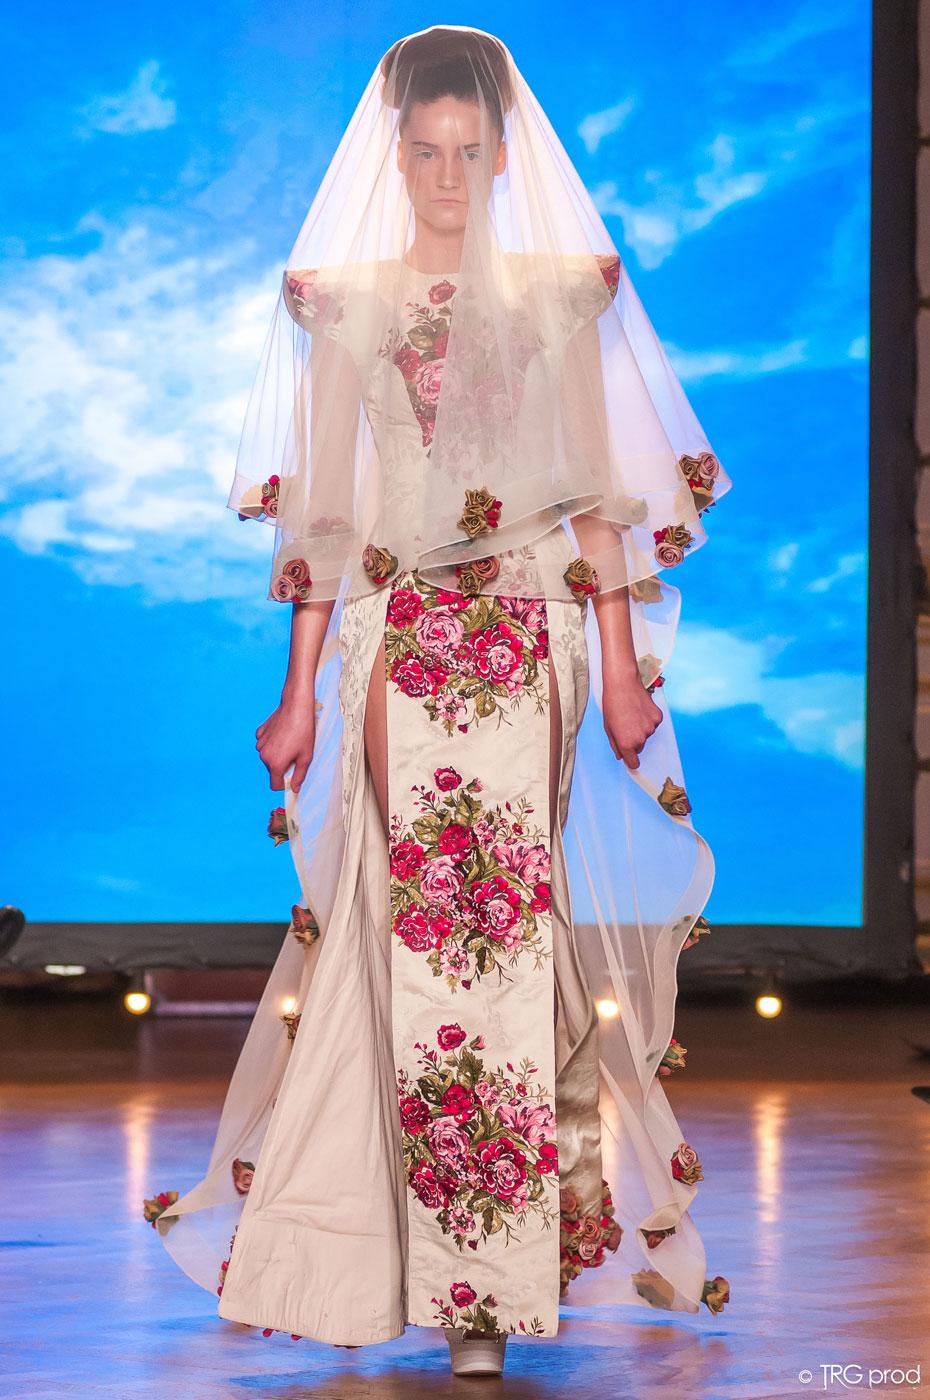 Legends-fashion-runway-show-haute-couture-paris-spring-2015-the-impression-22